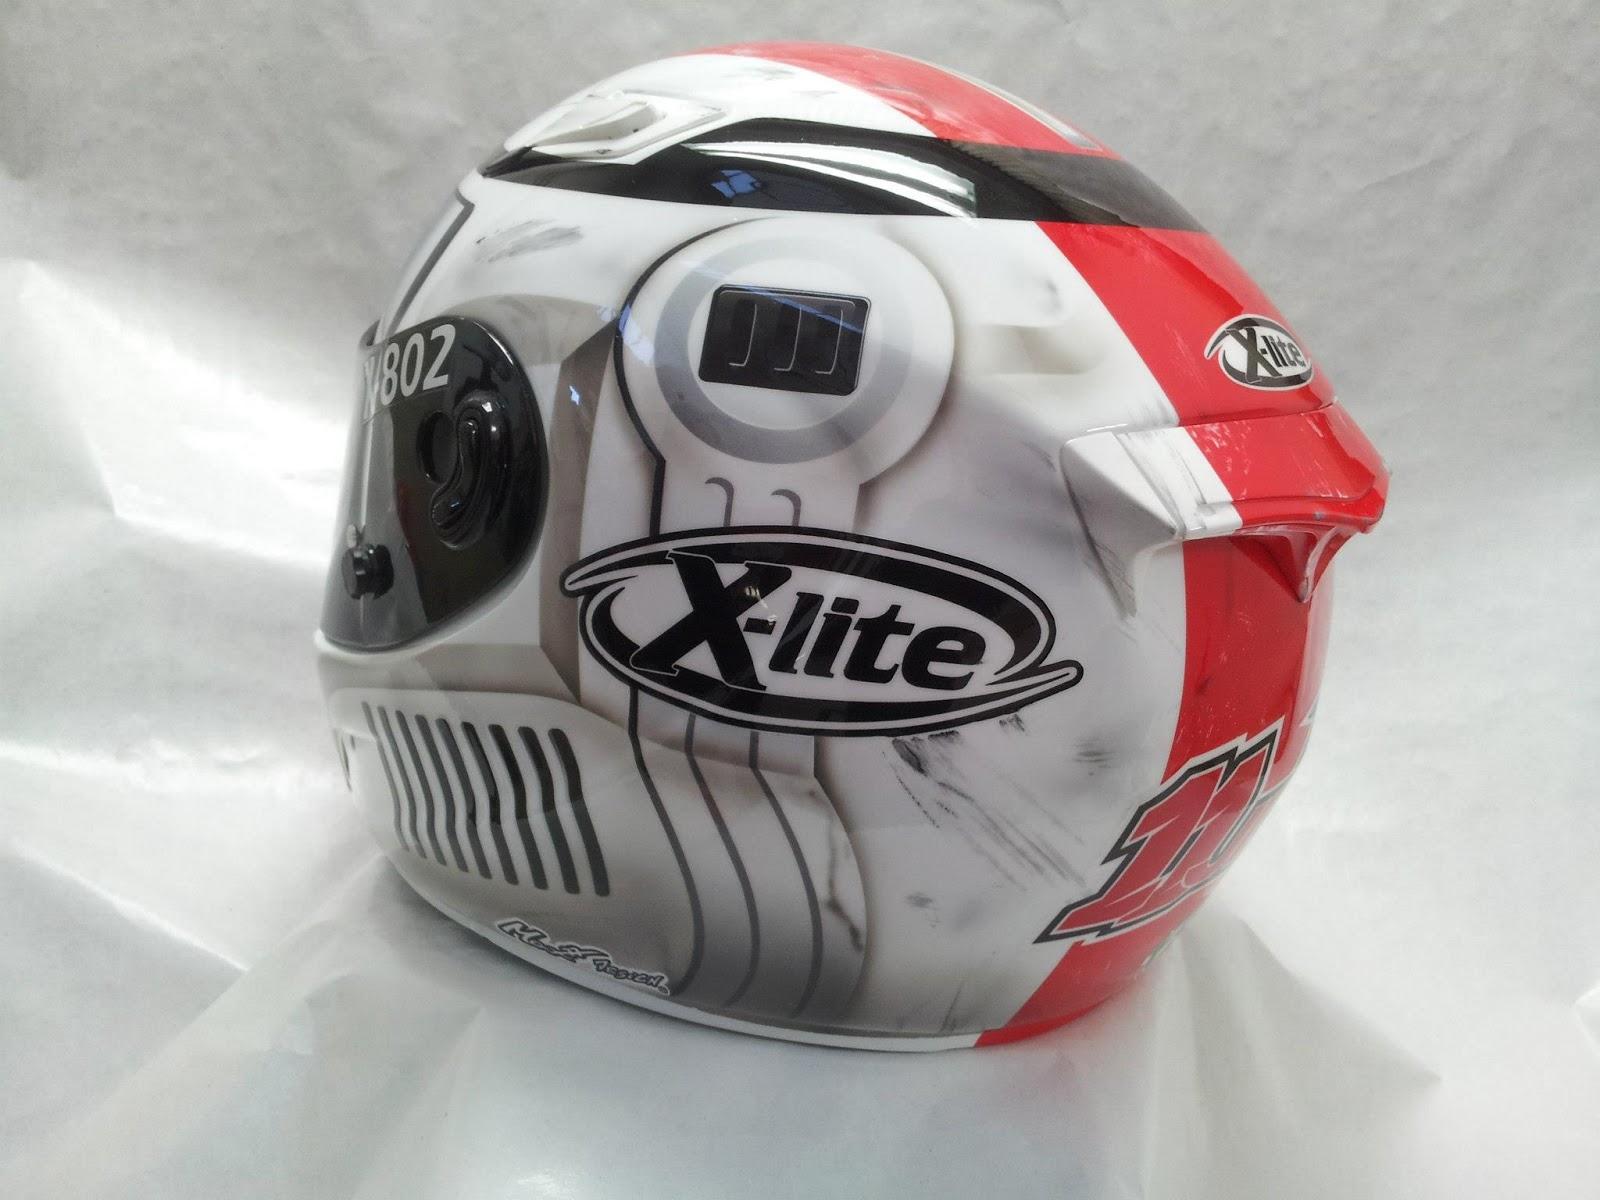 racing helmets garage x lite x 802r j guarnoni 2013 by. Black Bedroom Furniture Sets. Home Design Ideas